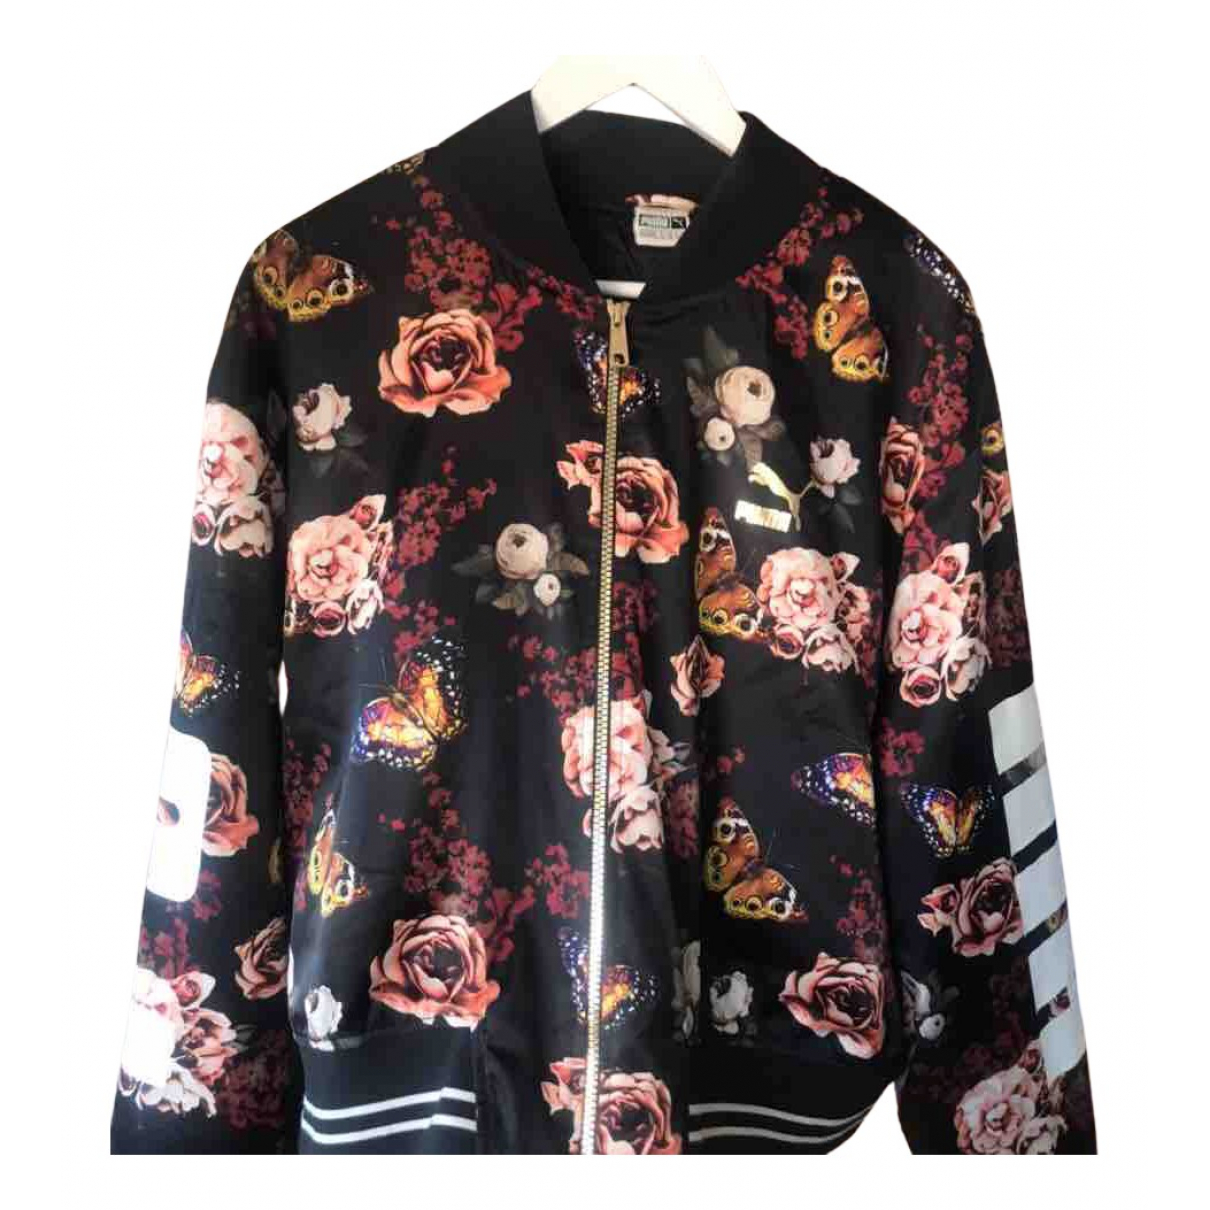 Puma N Multicolour Cotton jacket for Women XL International